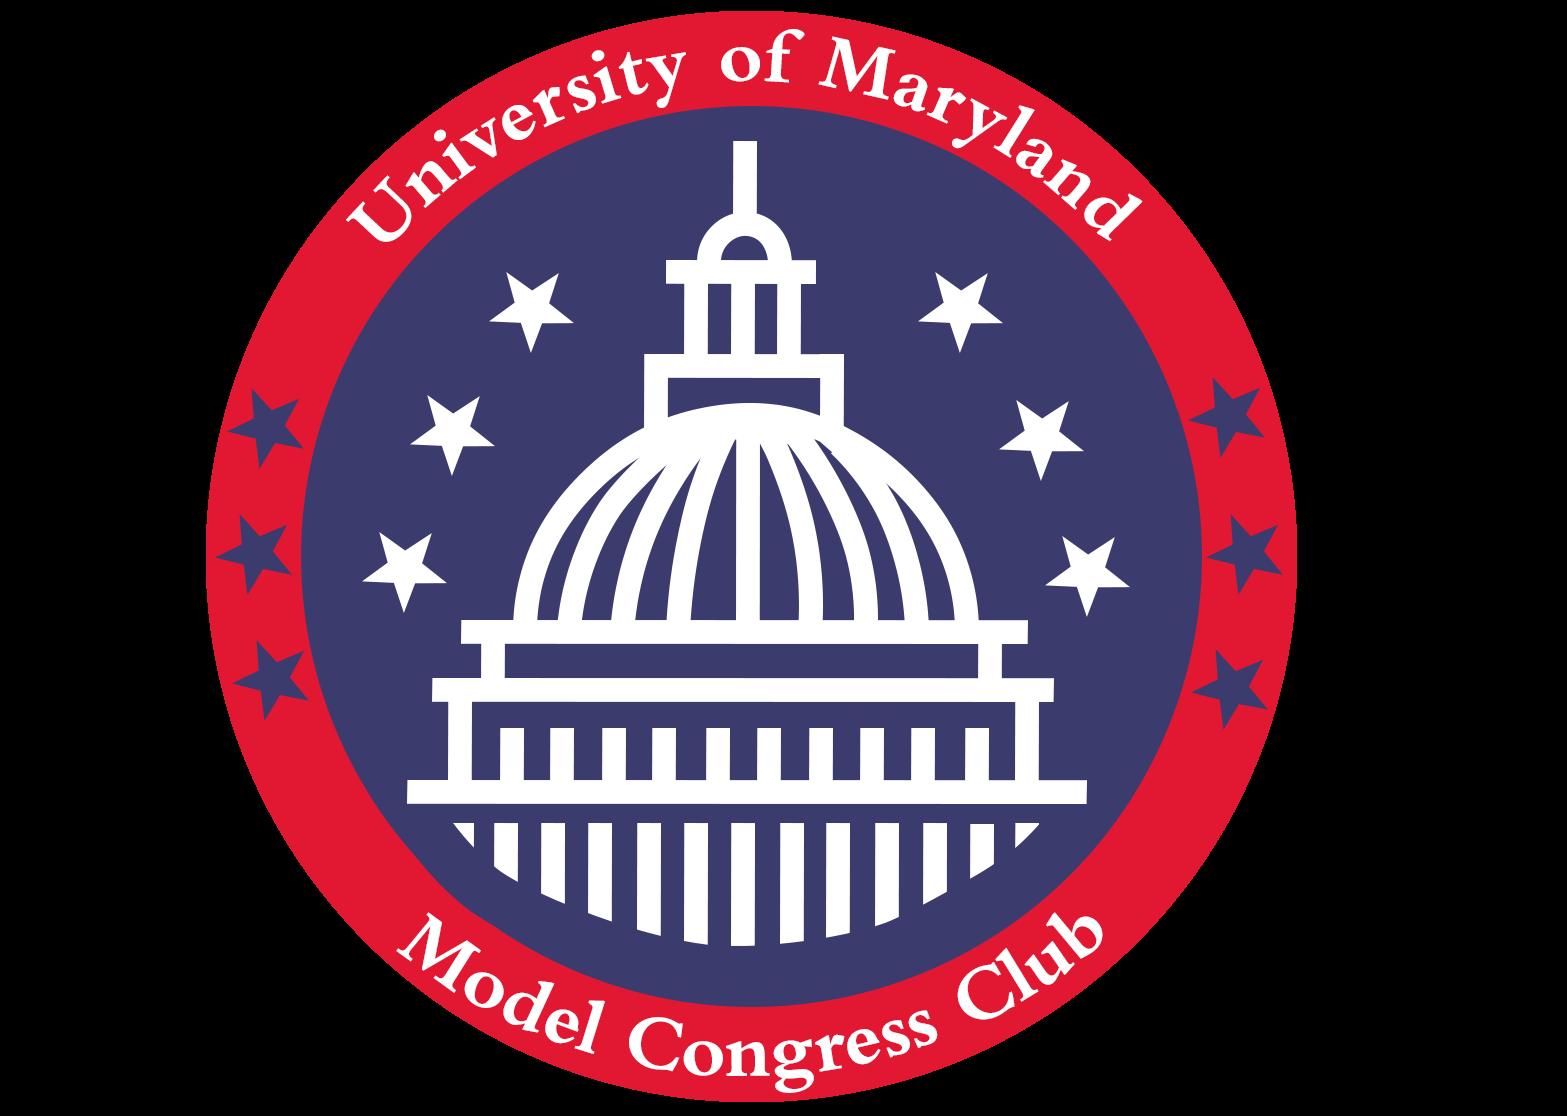 University of Maryland Model Congress